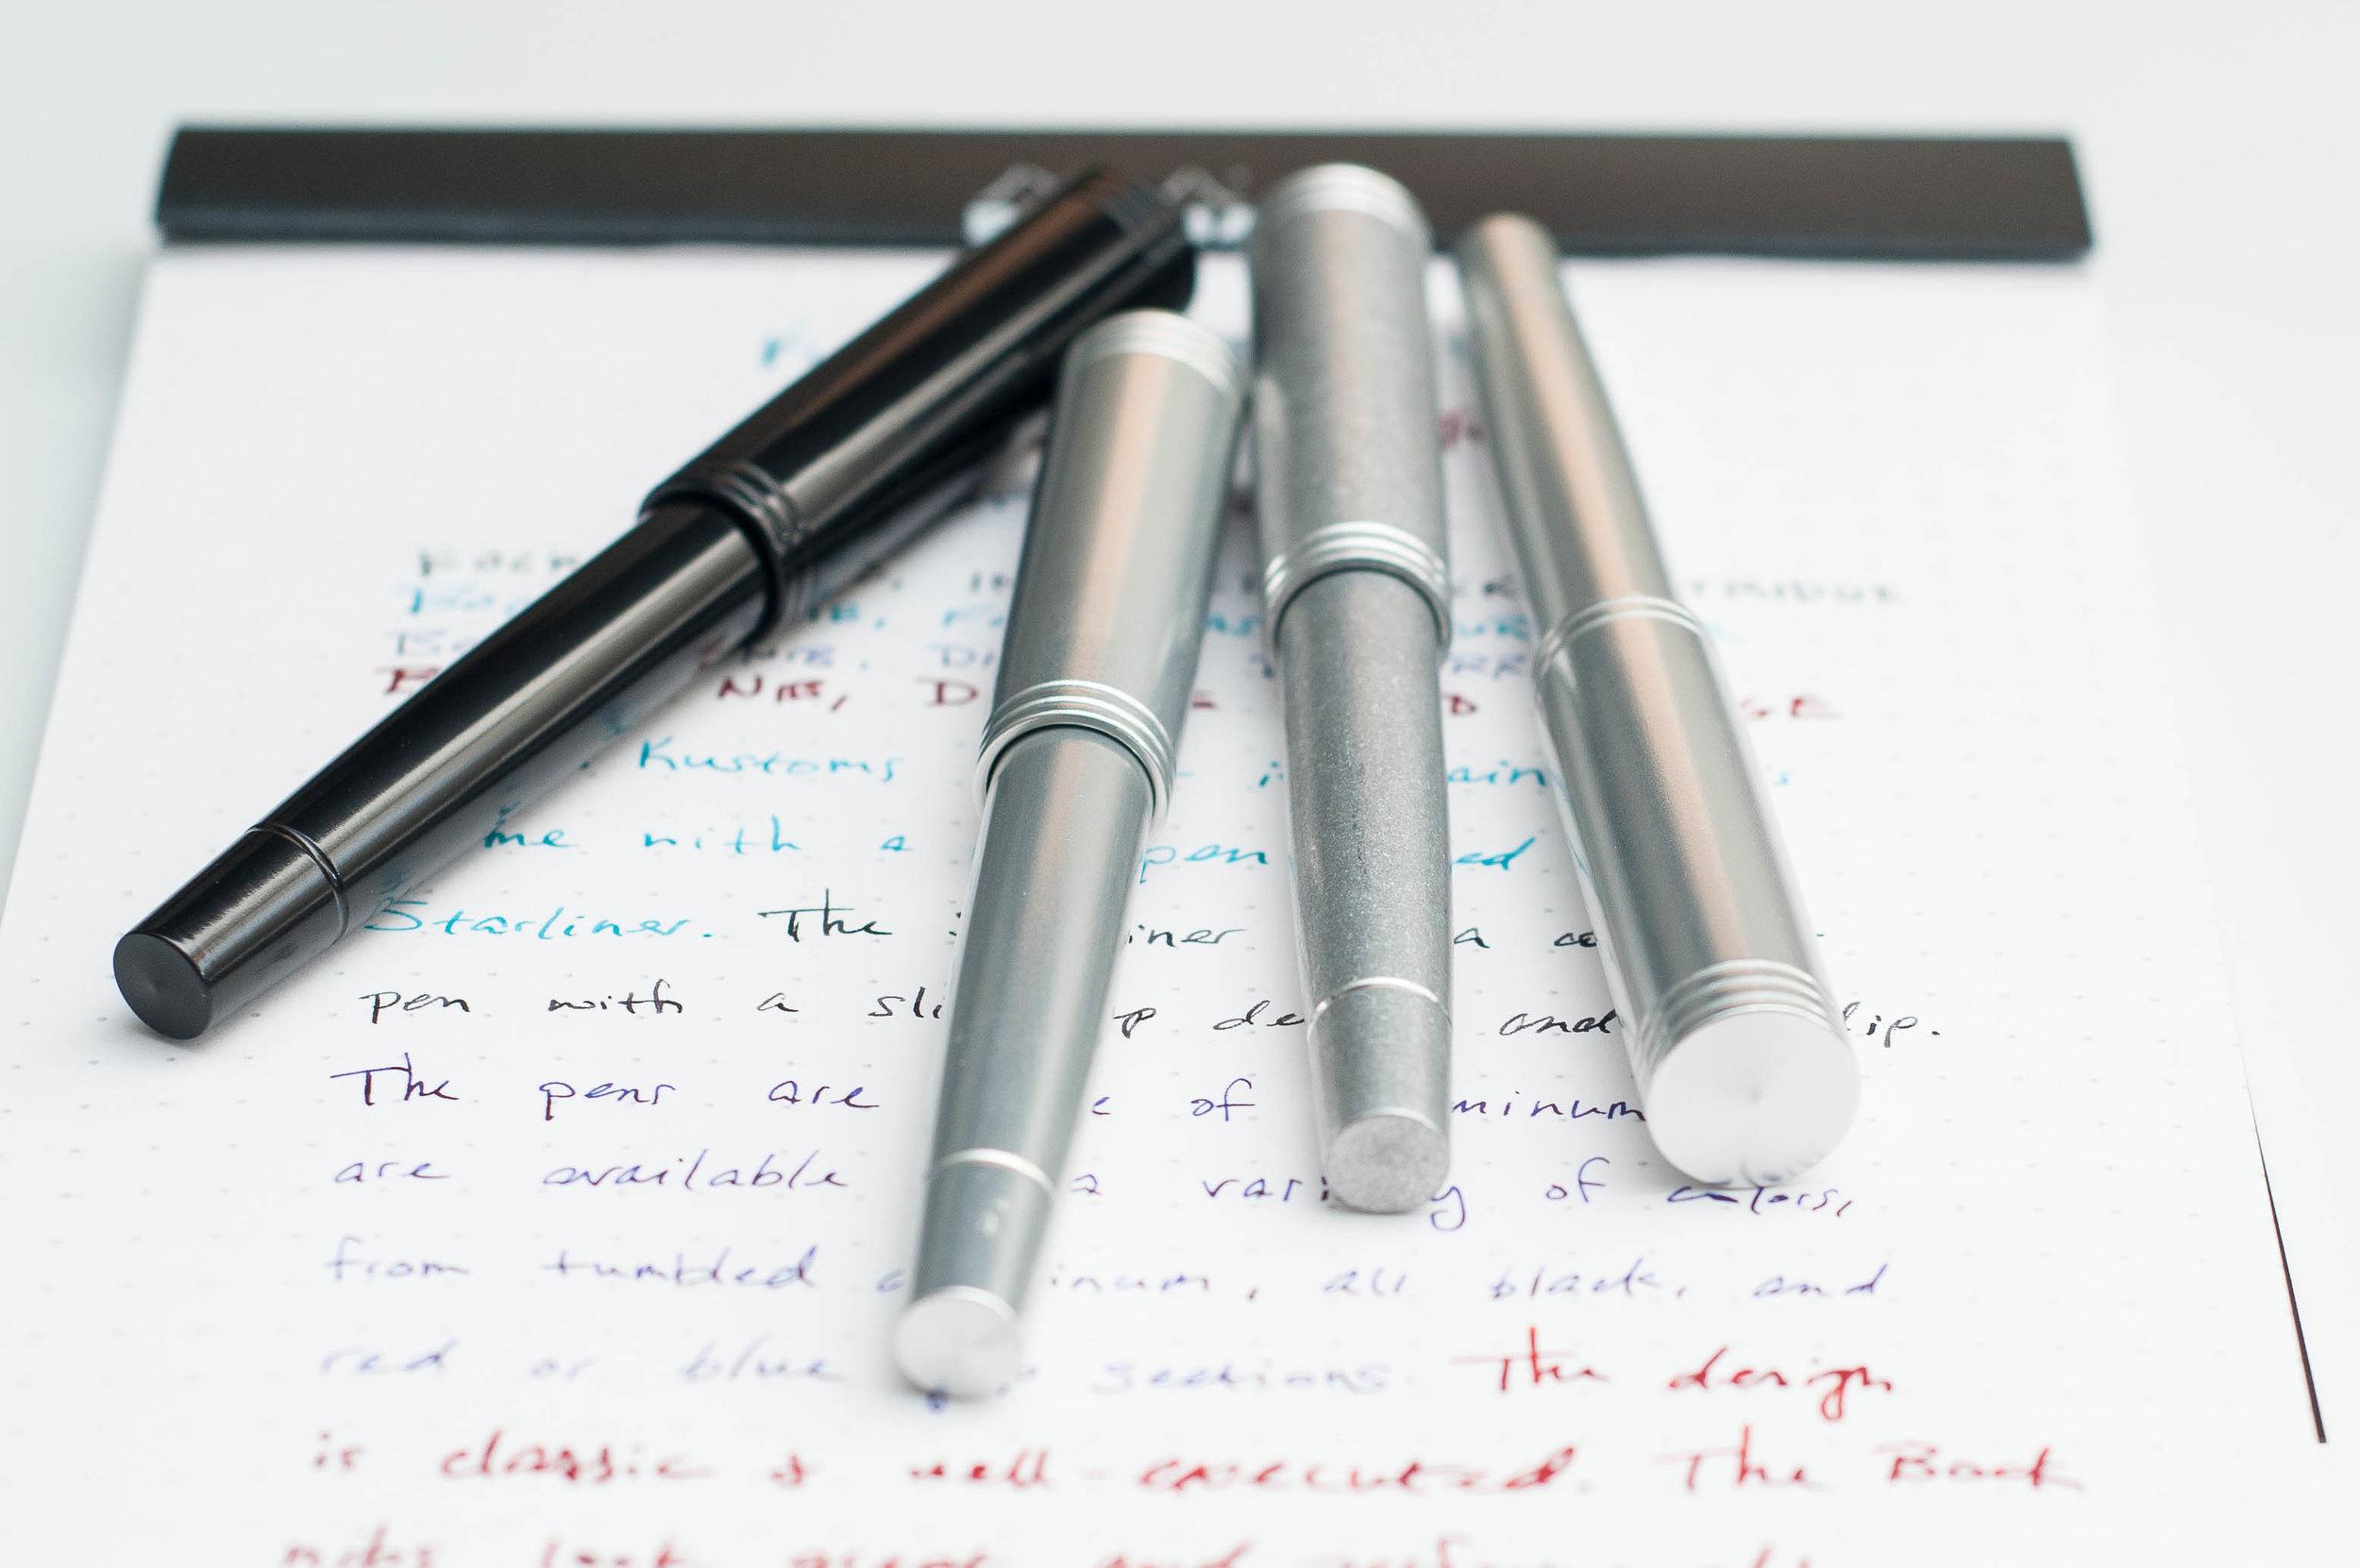 Karas Kustoms Starliner Fountain Pen Review